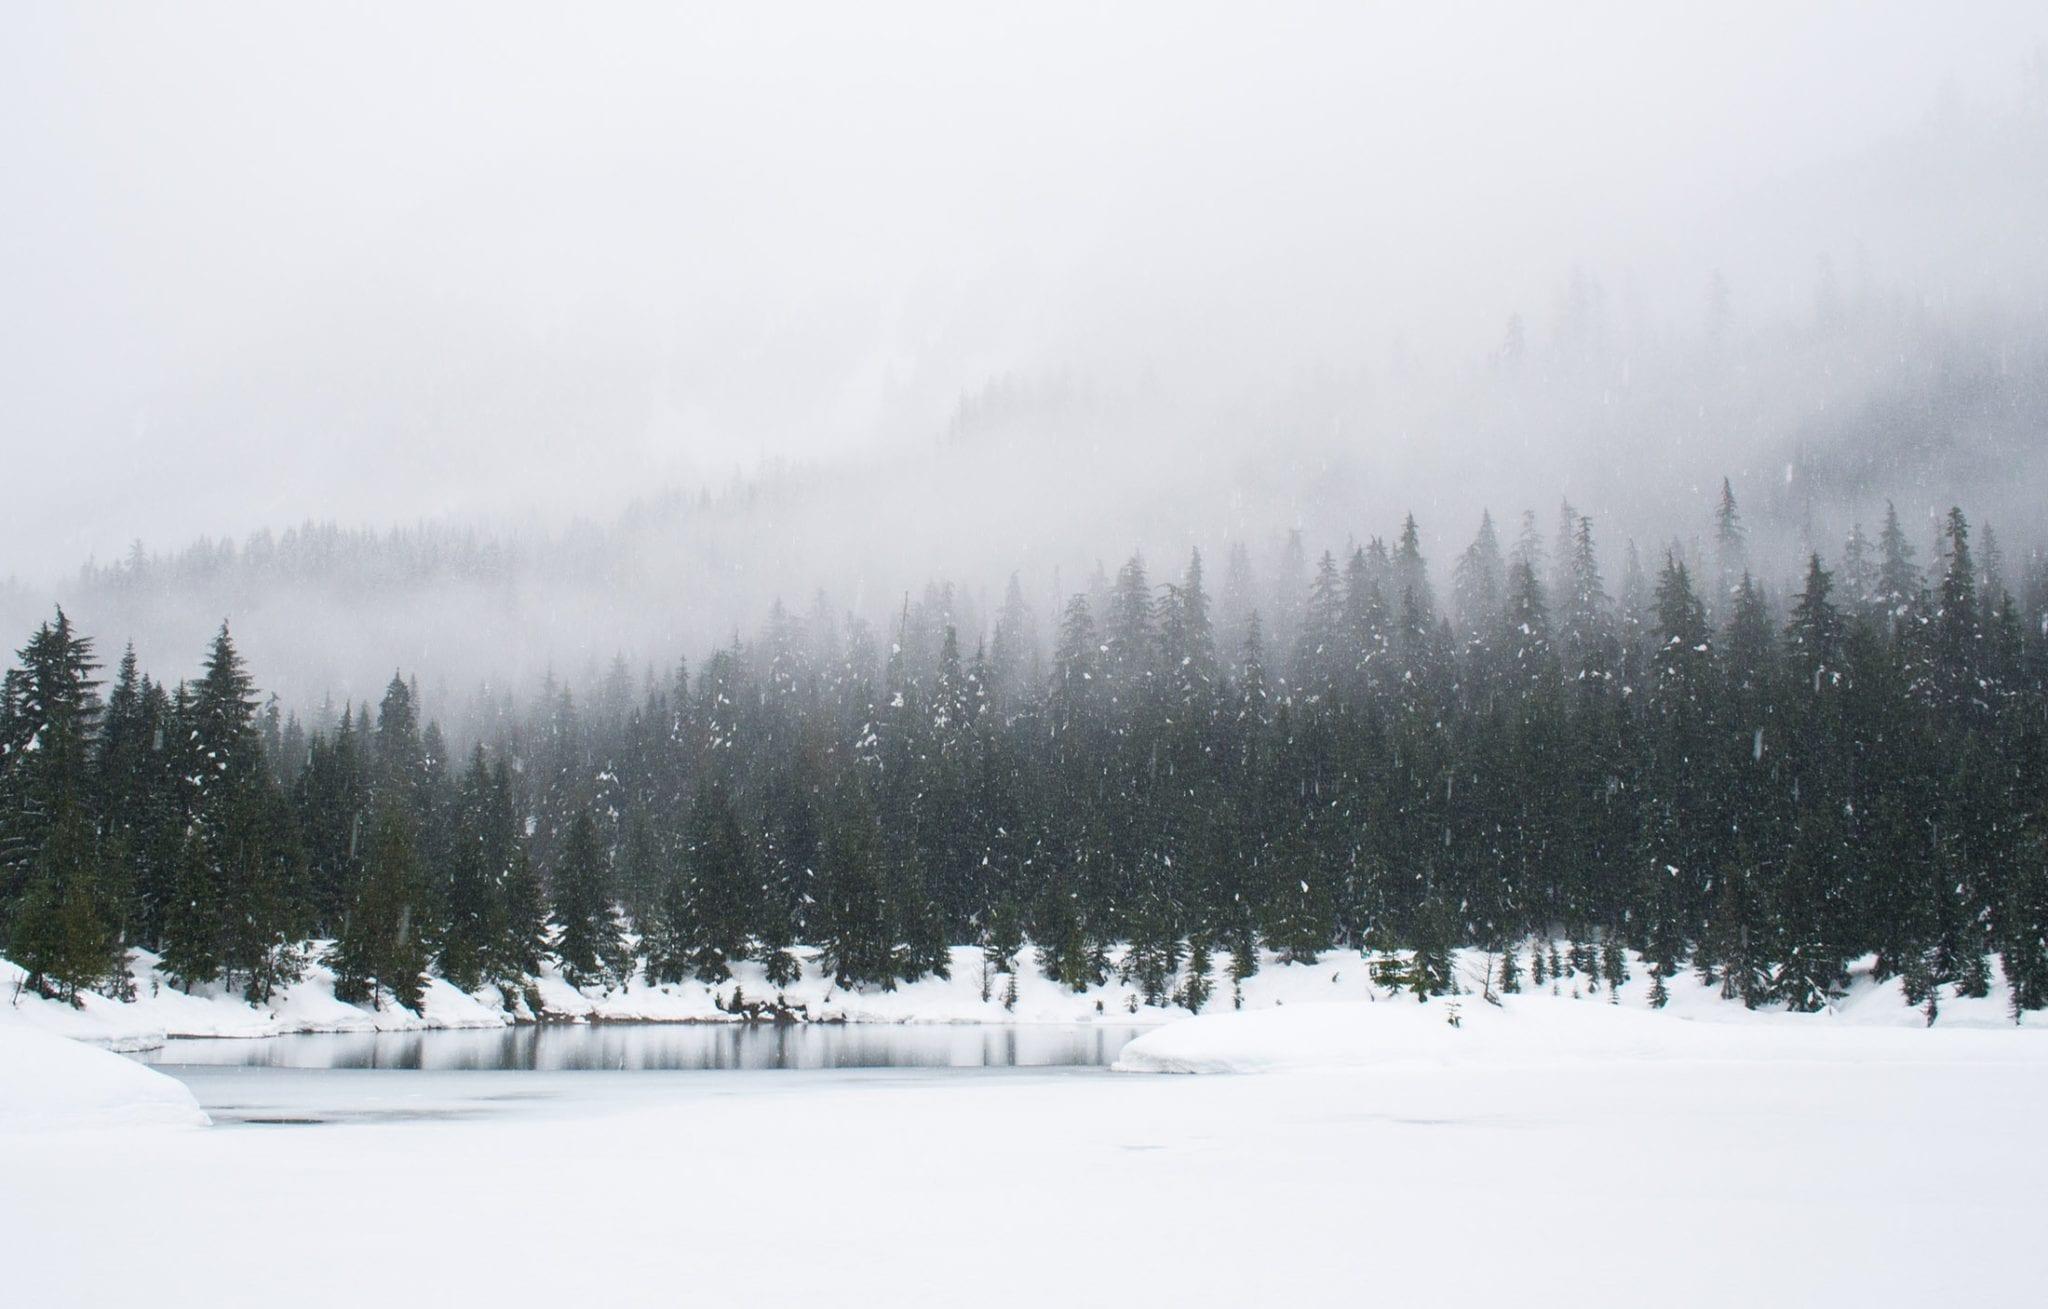 self-care during the polar vortex